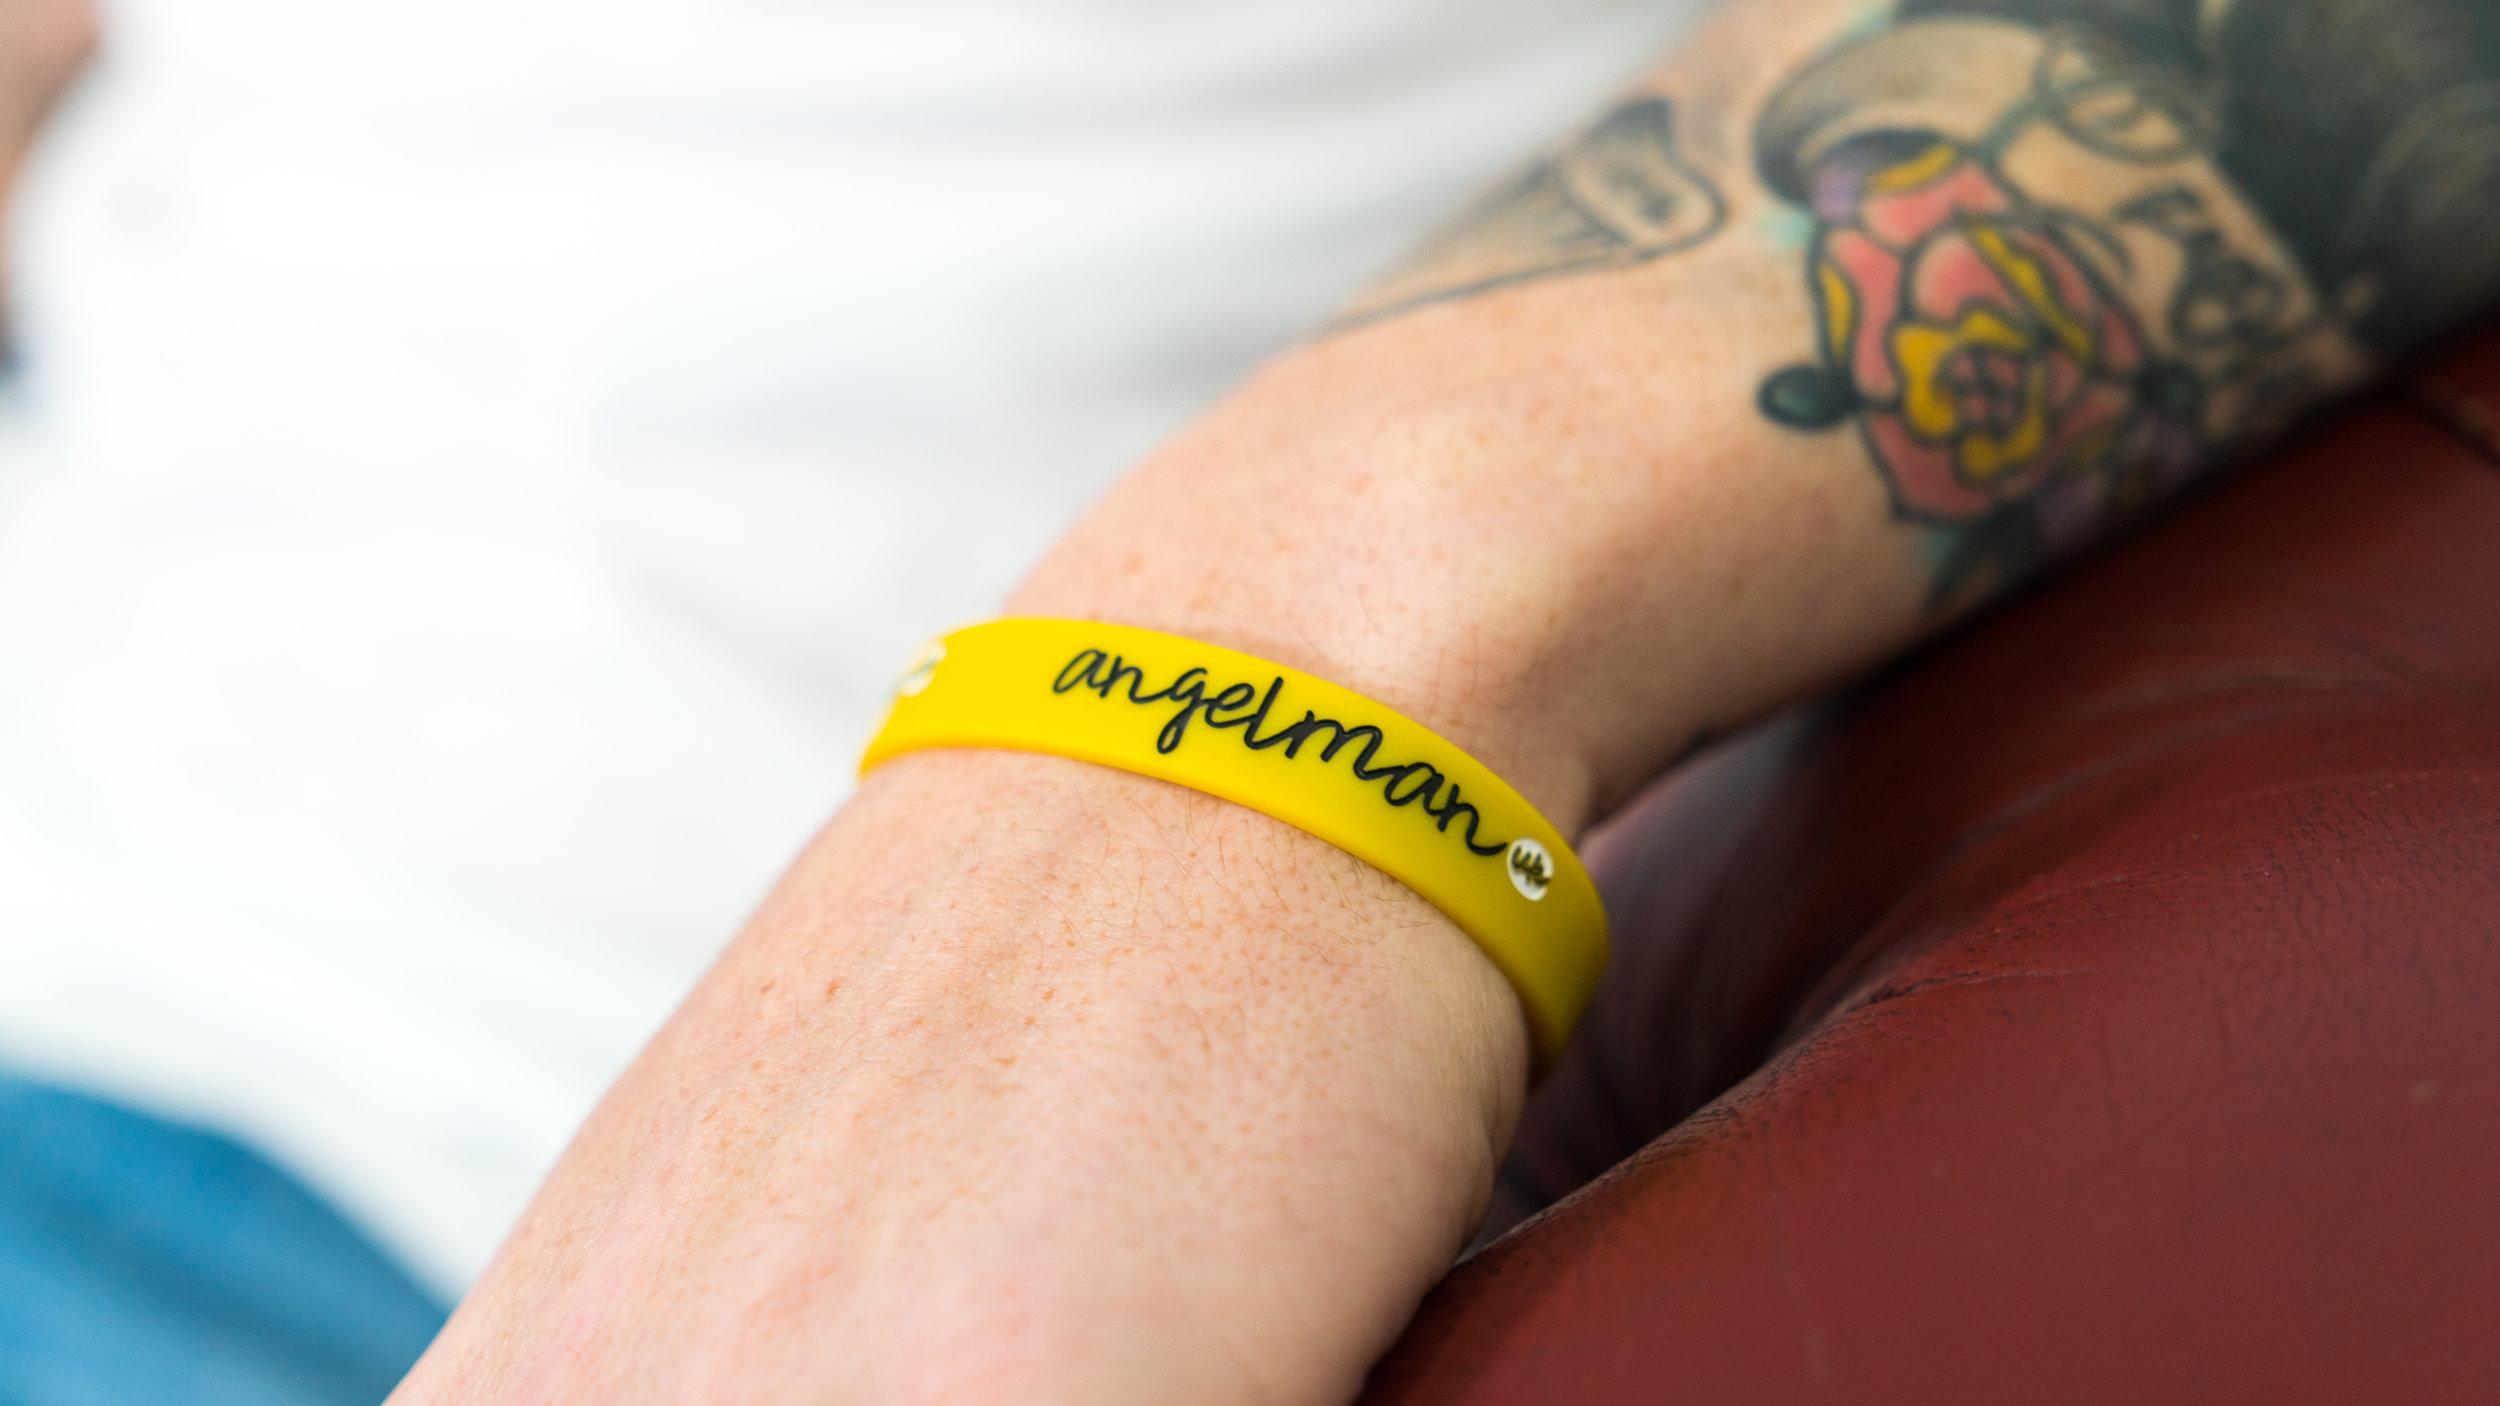 Angelman Uk Wristband